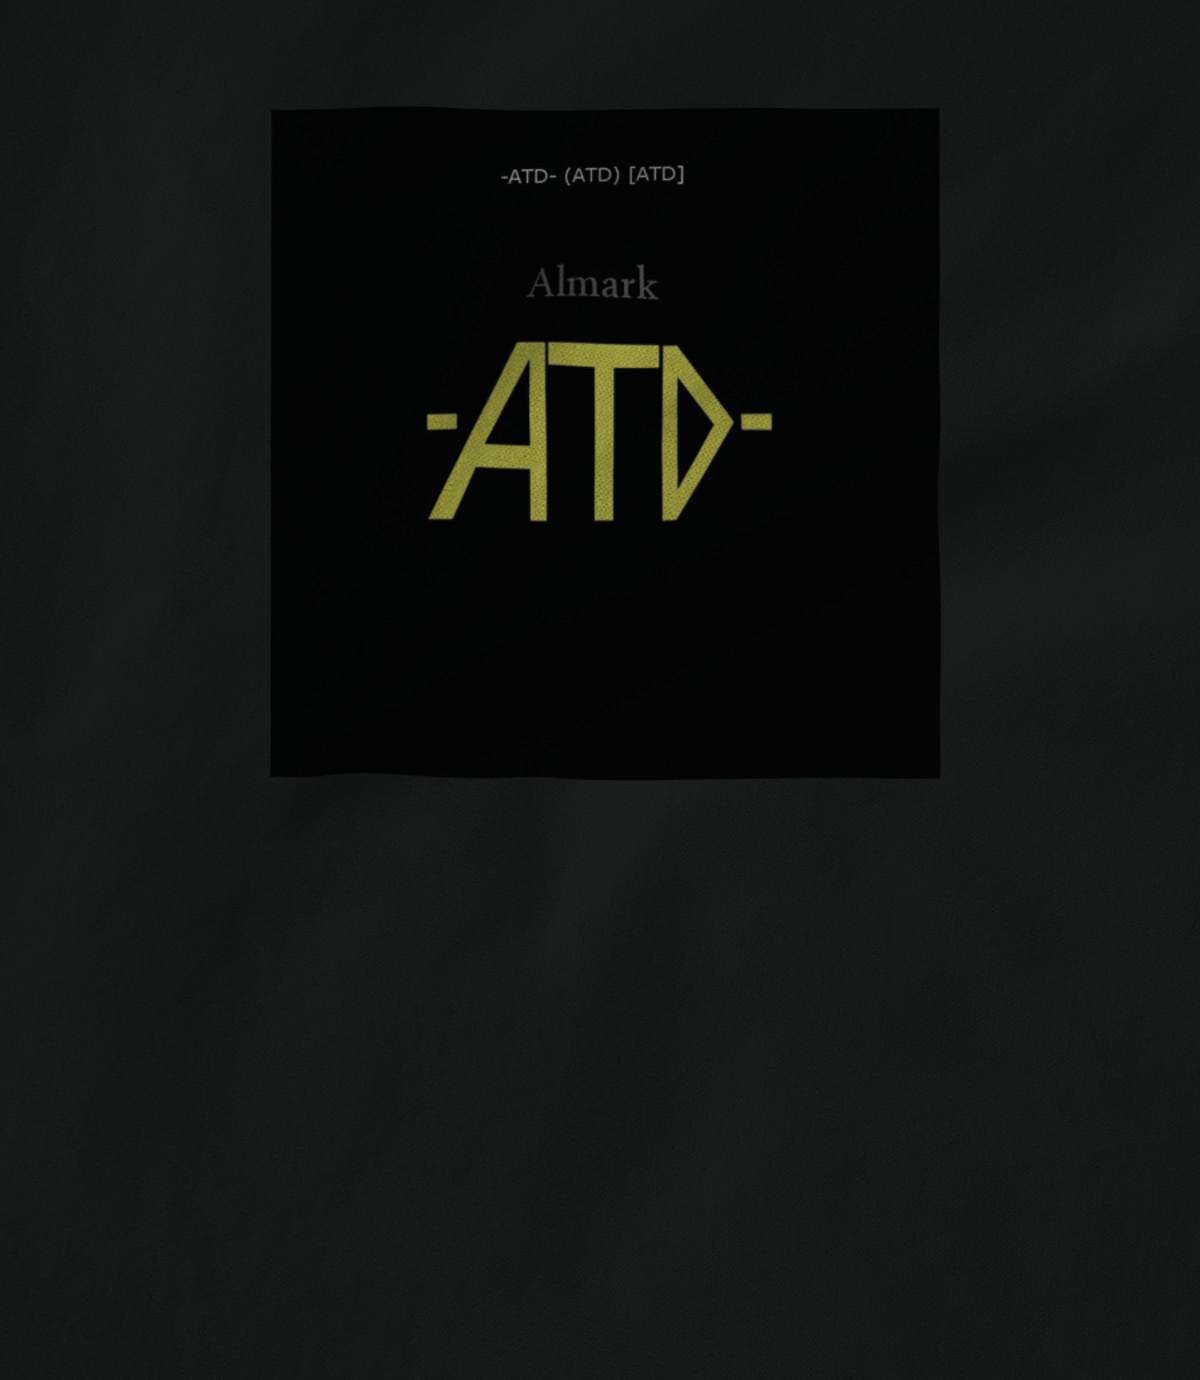 Almark  atd  album cover 1488082257